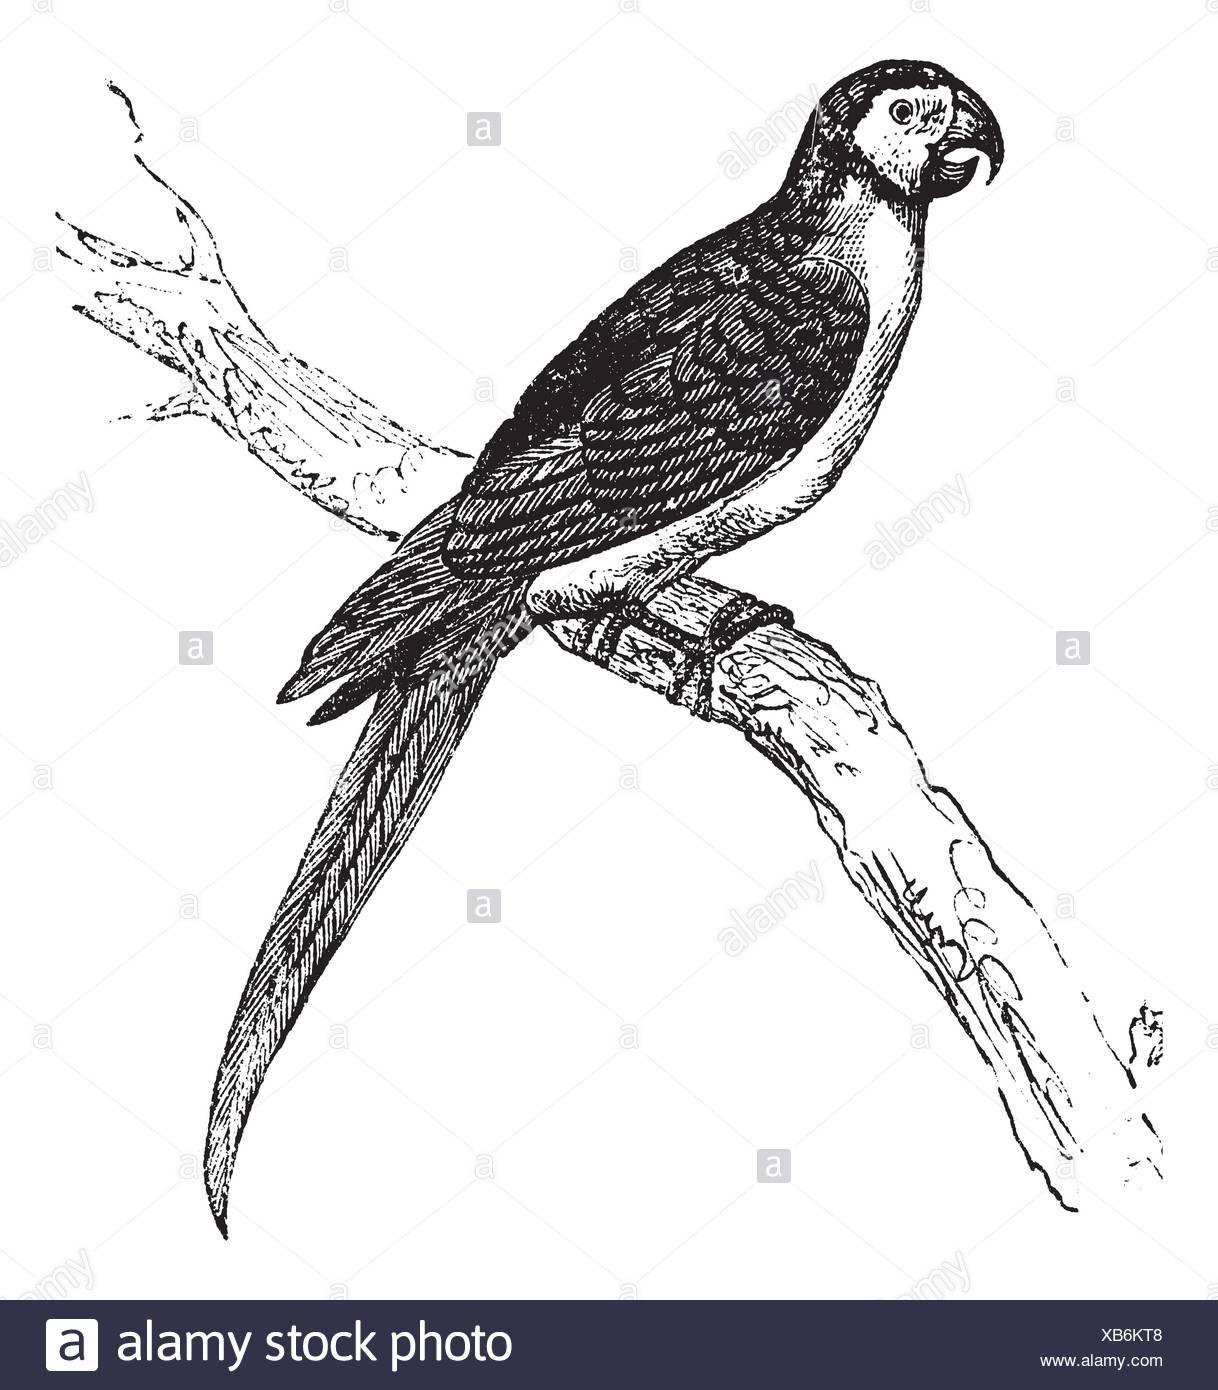 Parrot Illustration Vintage Print Stockfotos & Parrot Illustration ...